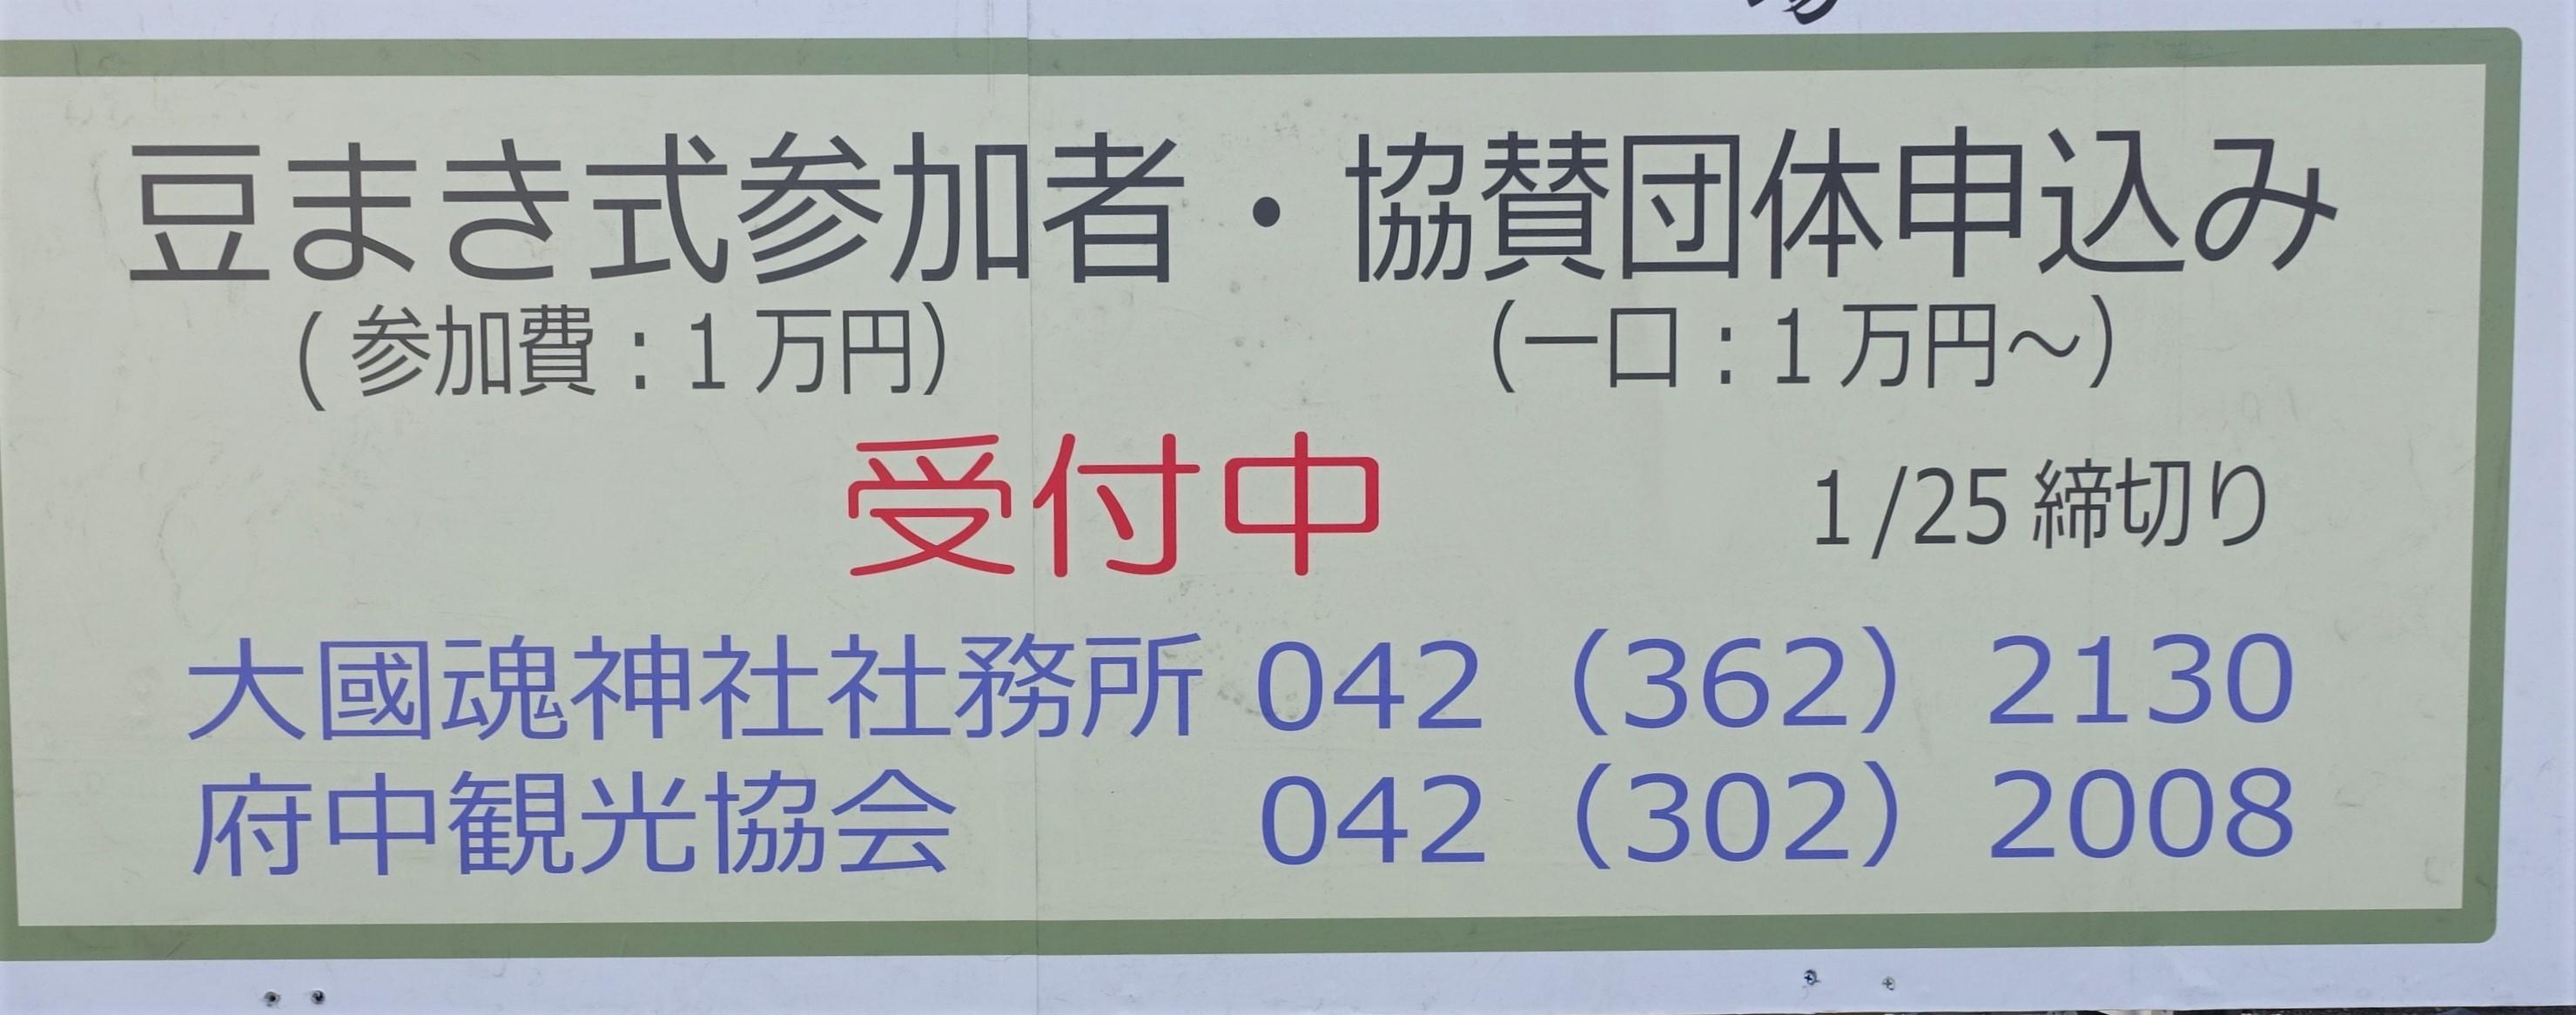 DSC09673.jpg